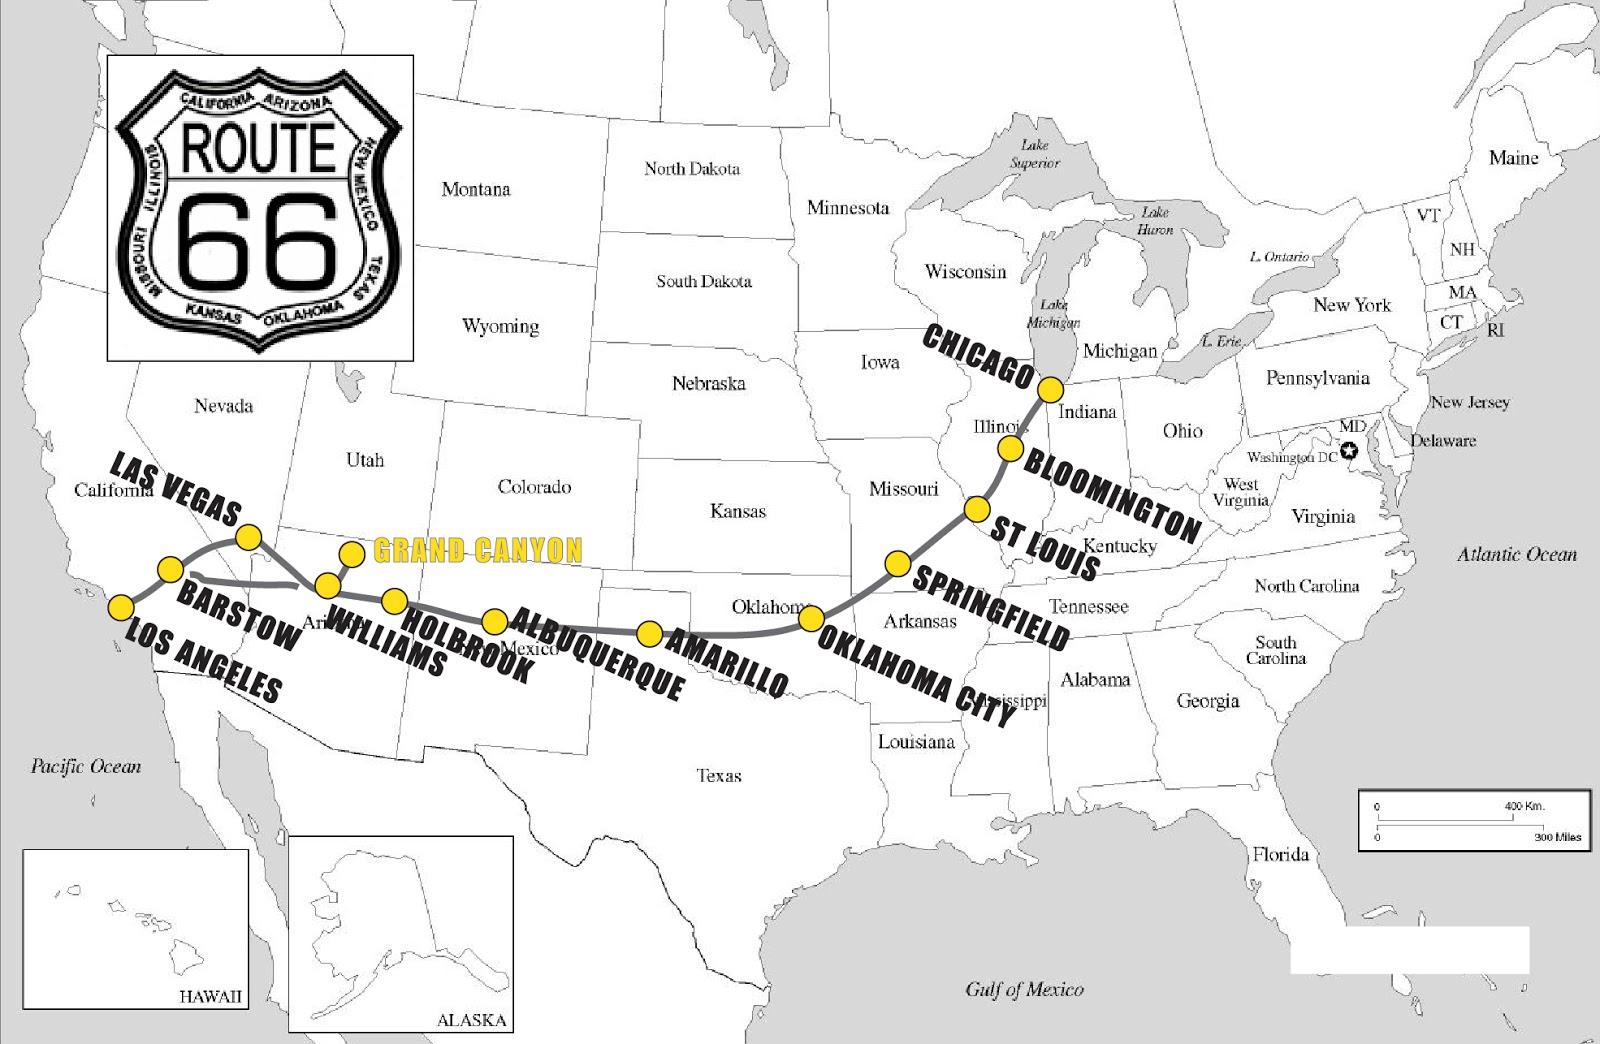 Legendaarisen Route 66 N Reitti Ja Muhkeat Maisemat Route 66